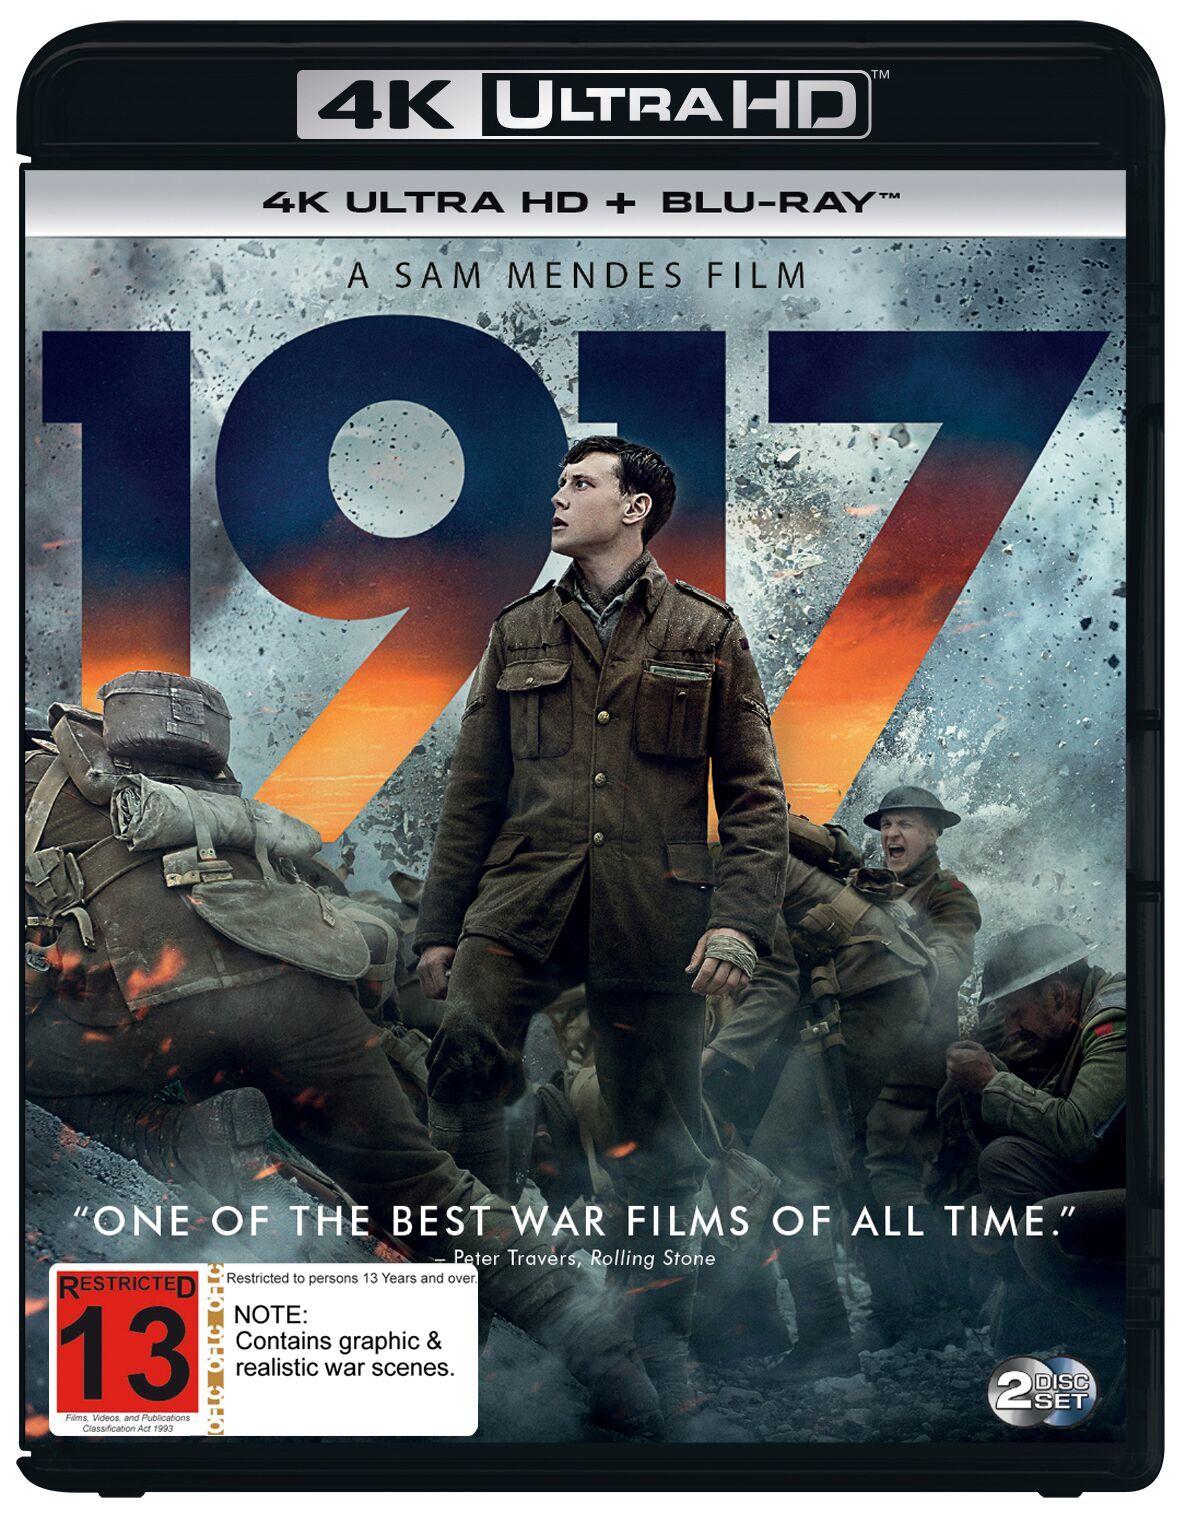 1917 (4K Ultra HD Blu-ray) on UHD Blu-ray image